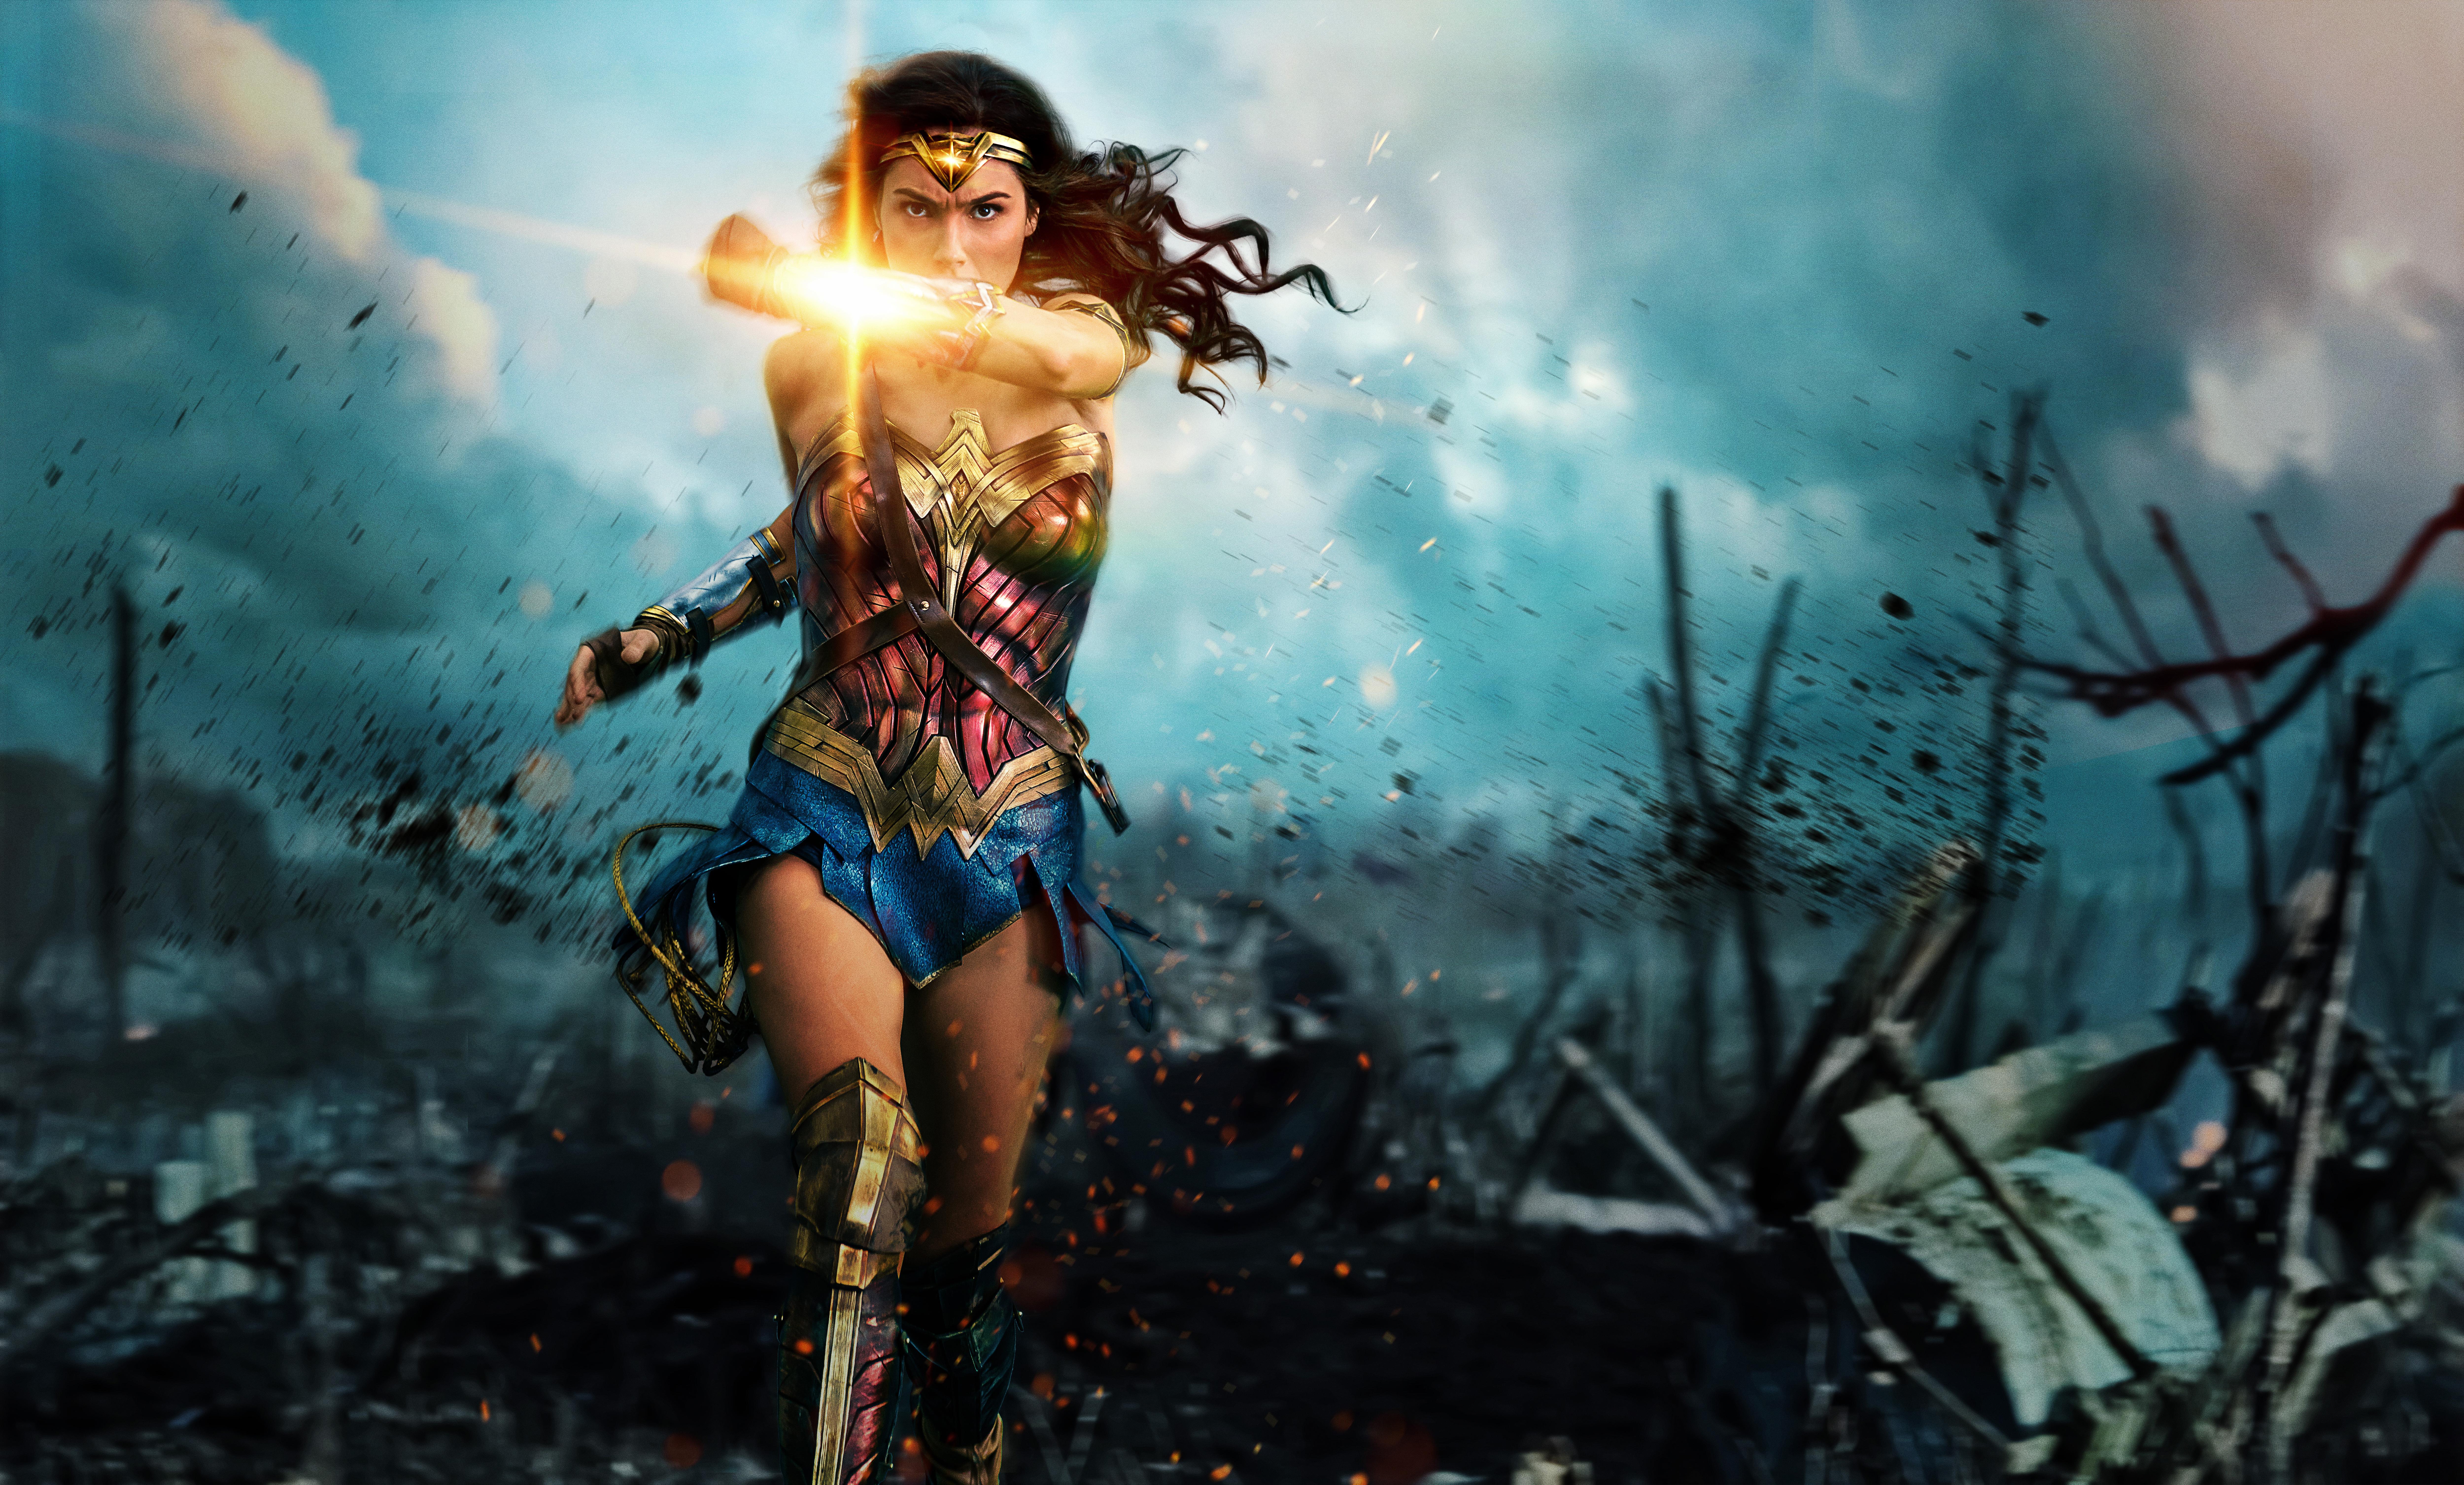 Hd wallpaper wonder woman - Movie Wonder Woman Gal Gadot Movie Dc Comics Wallpaper